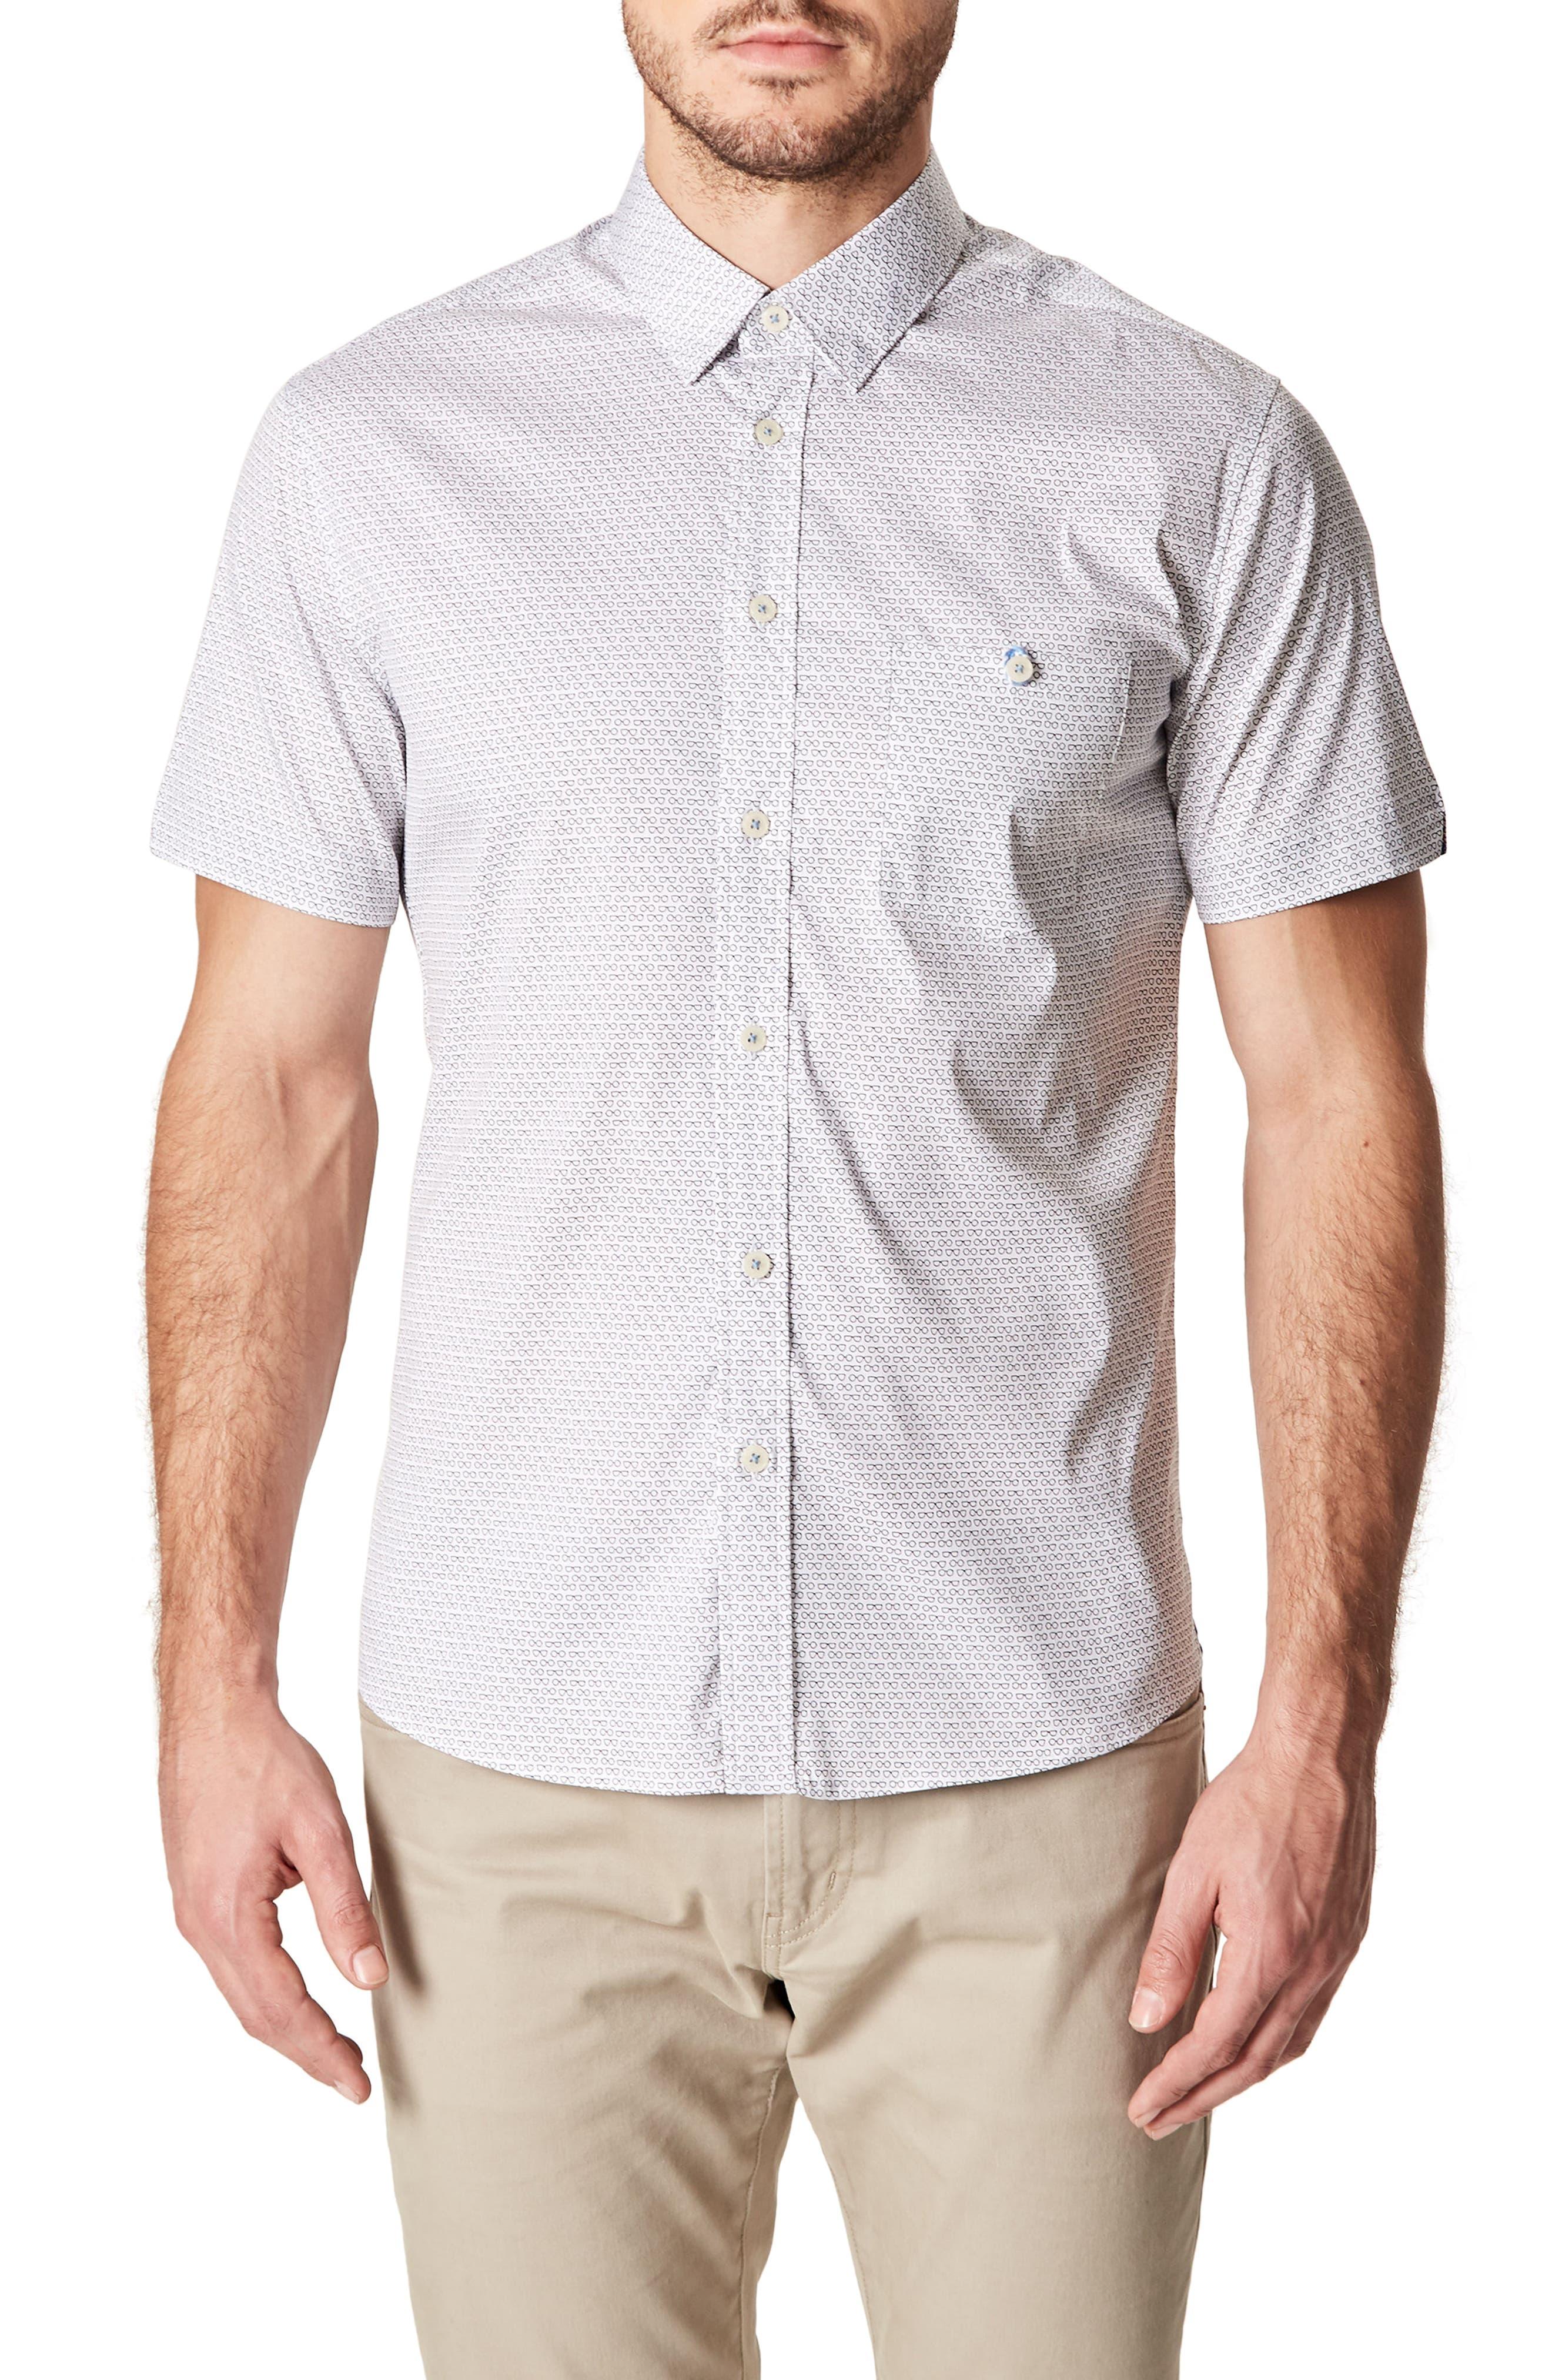 Bright Life Woven Shirt,                             Main thumbnail 1, color,                             WHITE